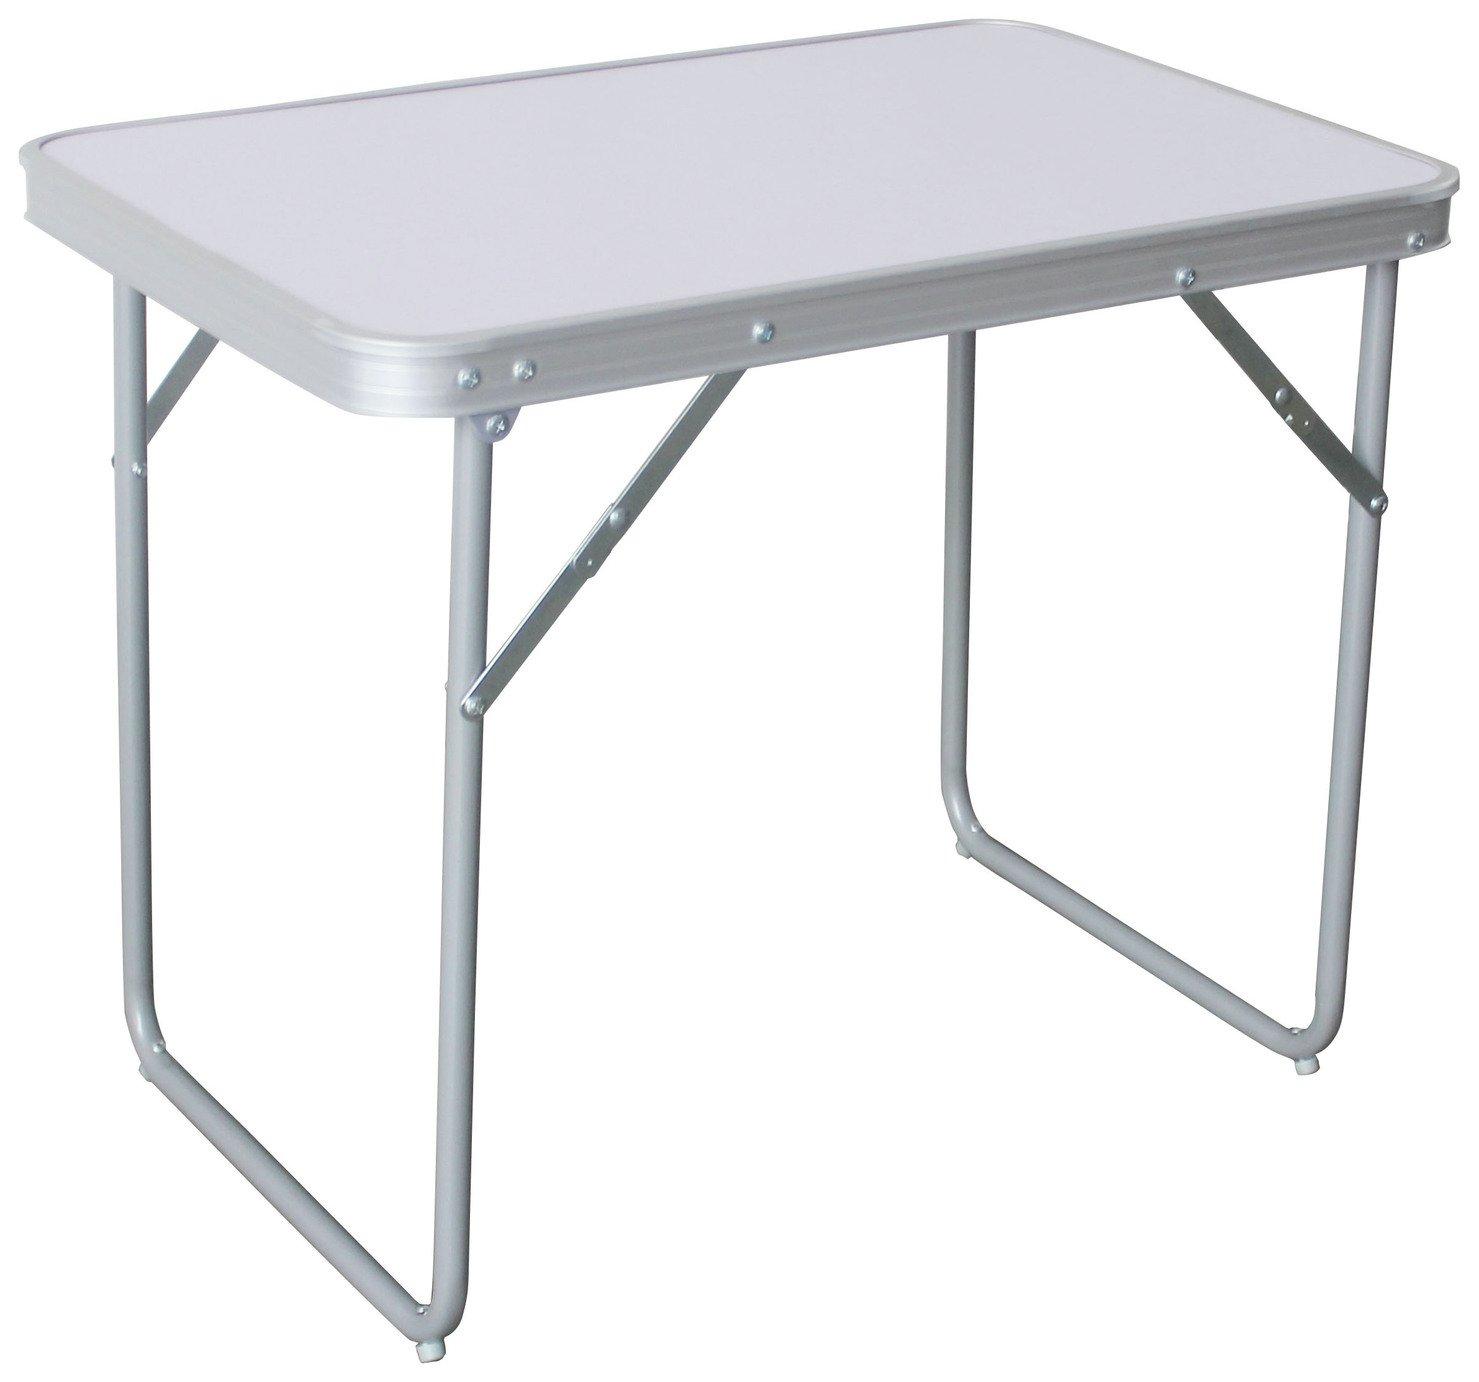 image of folding camping table. Black Bedroom Furniture Sets. Home Design Ideas